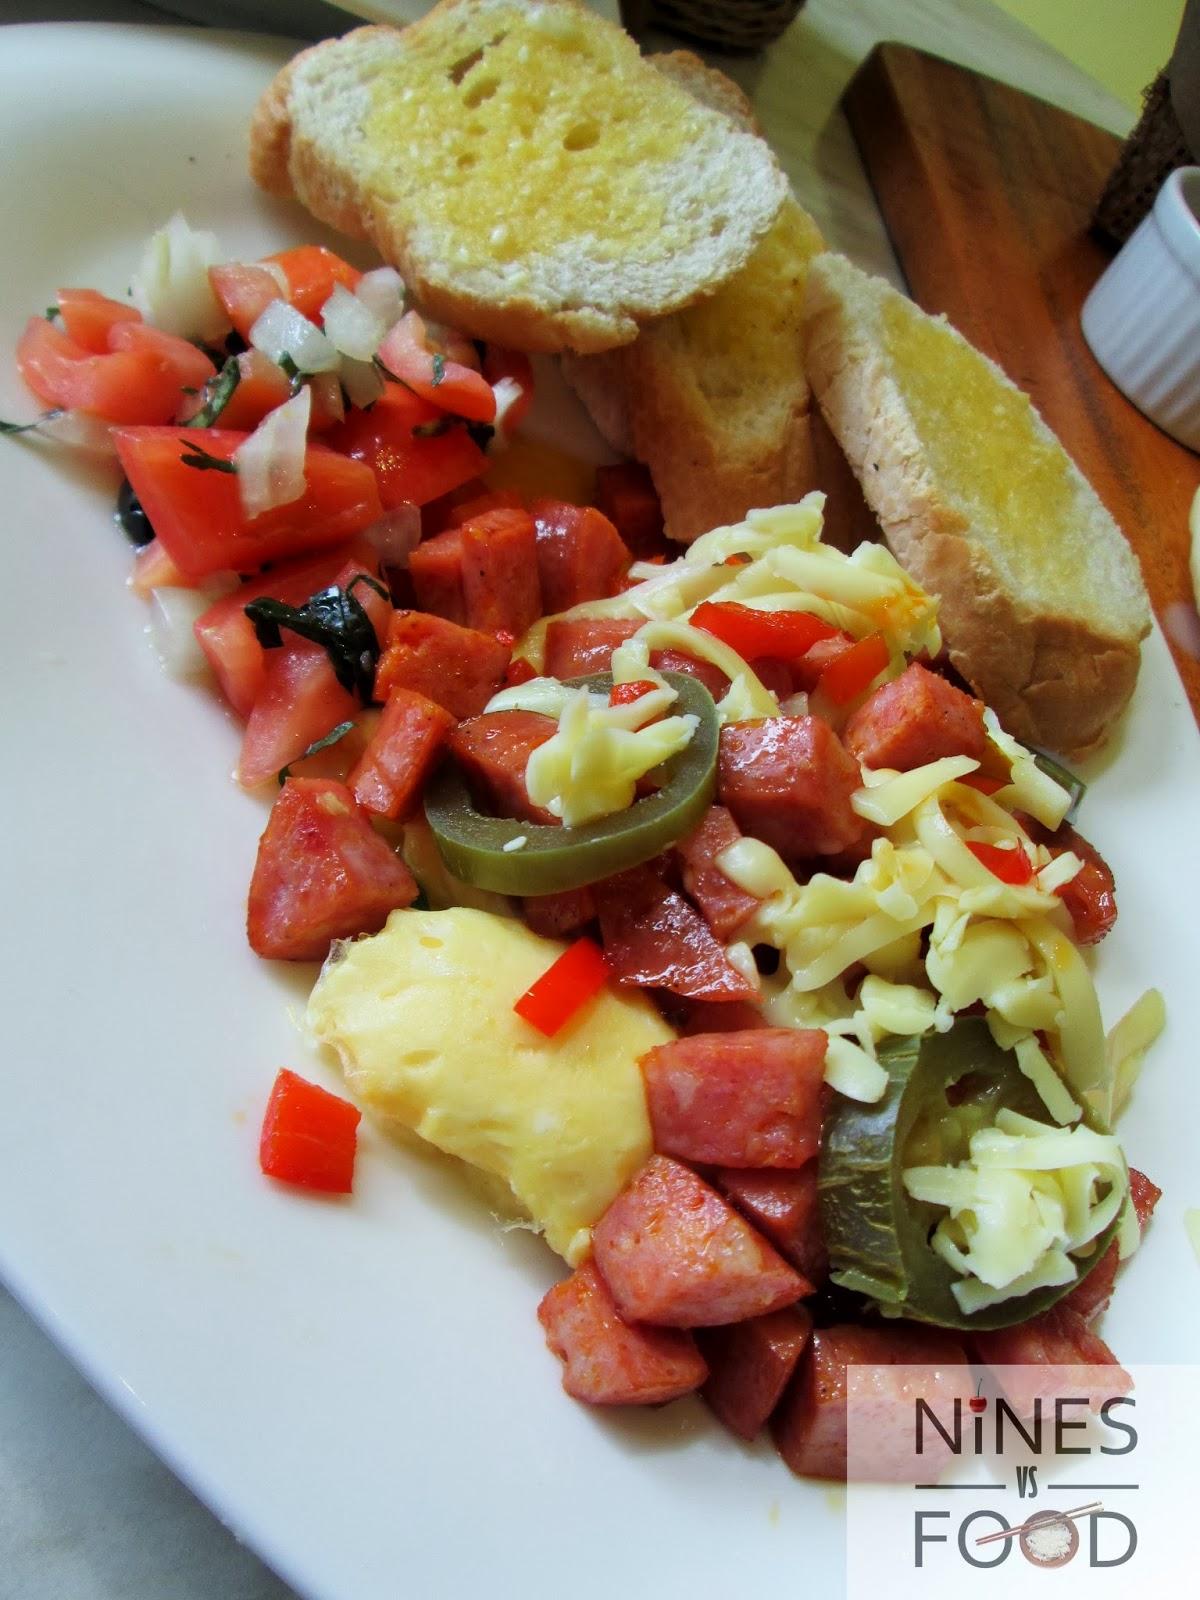 Nines vs. Food - B&P Shaw Mandaluyong-22.jpg